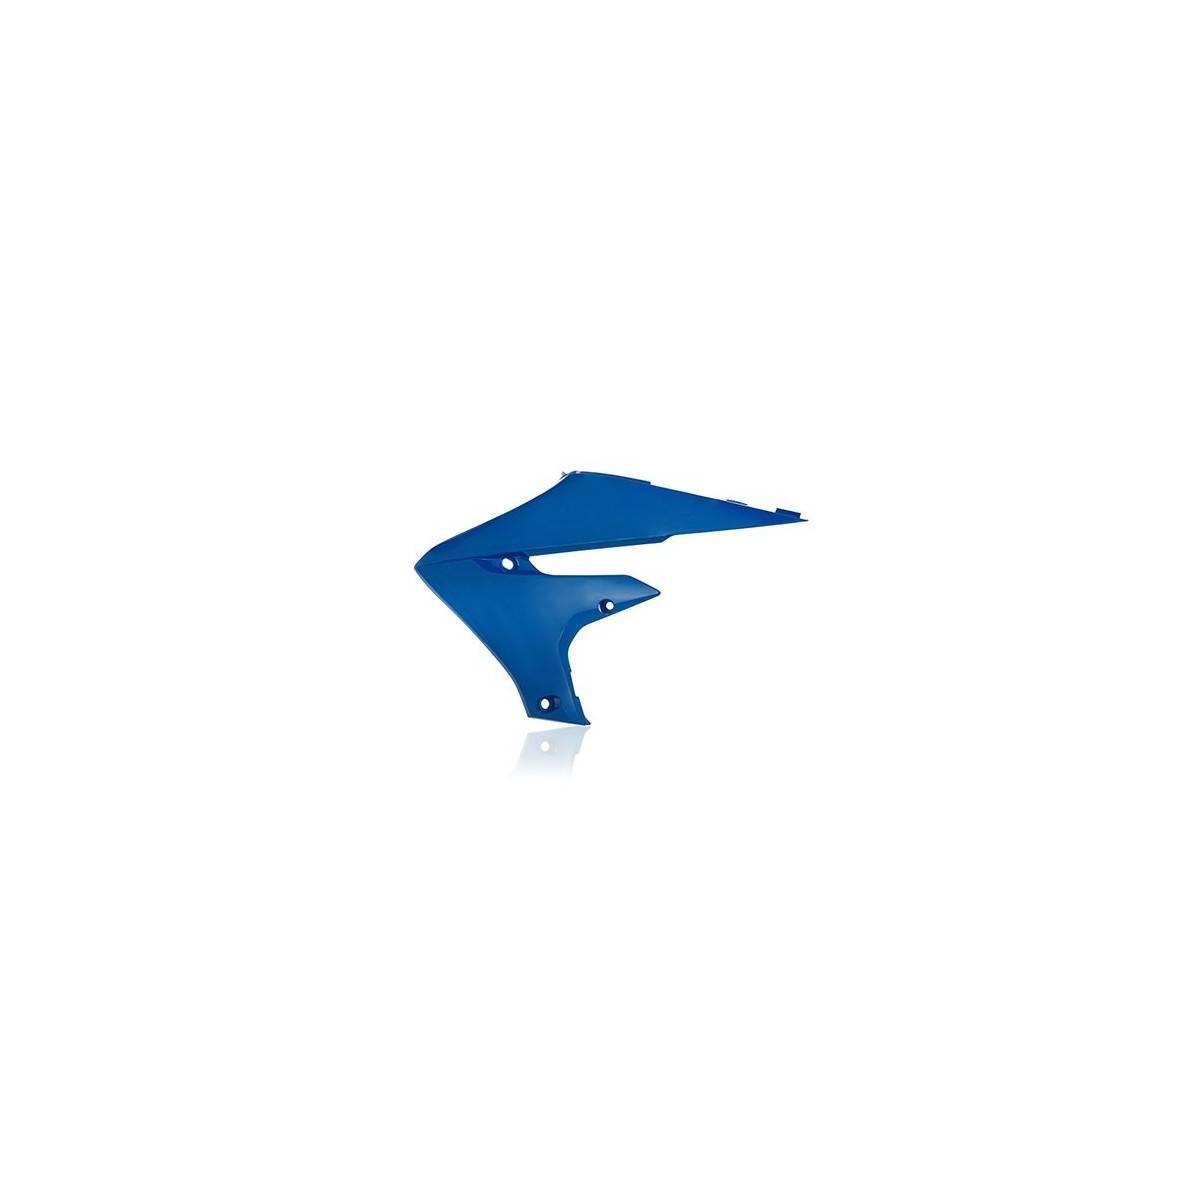 0022956-040 - Cubiertas Inferiores Radiador Yamaha Yzf450 14 17 Azul